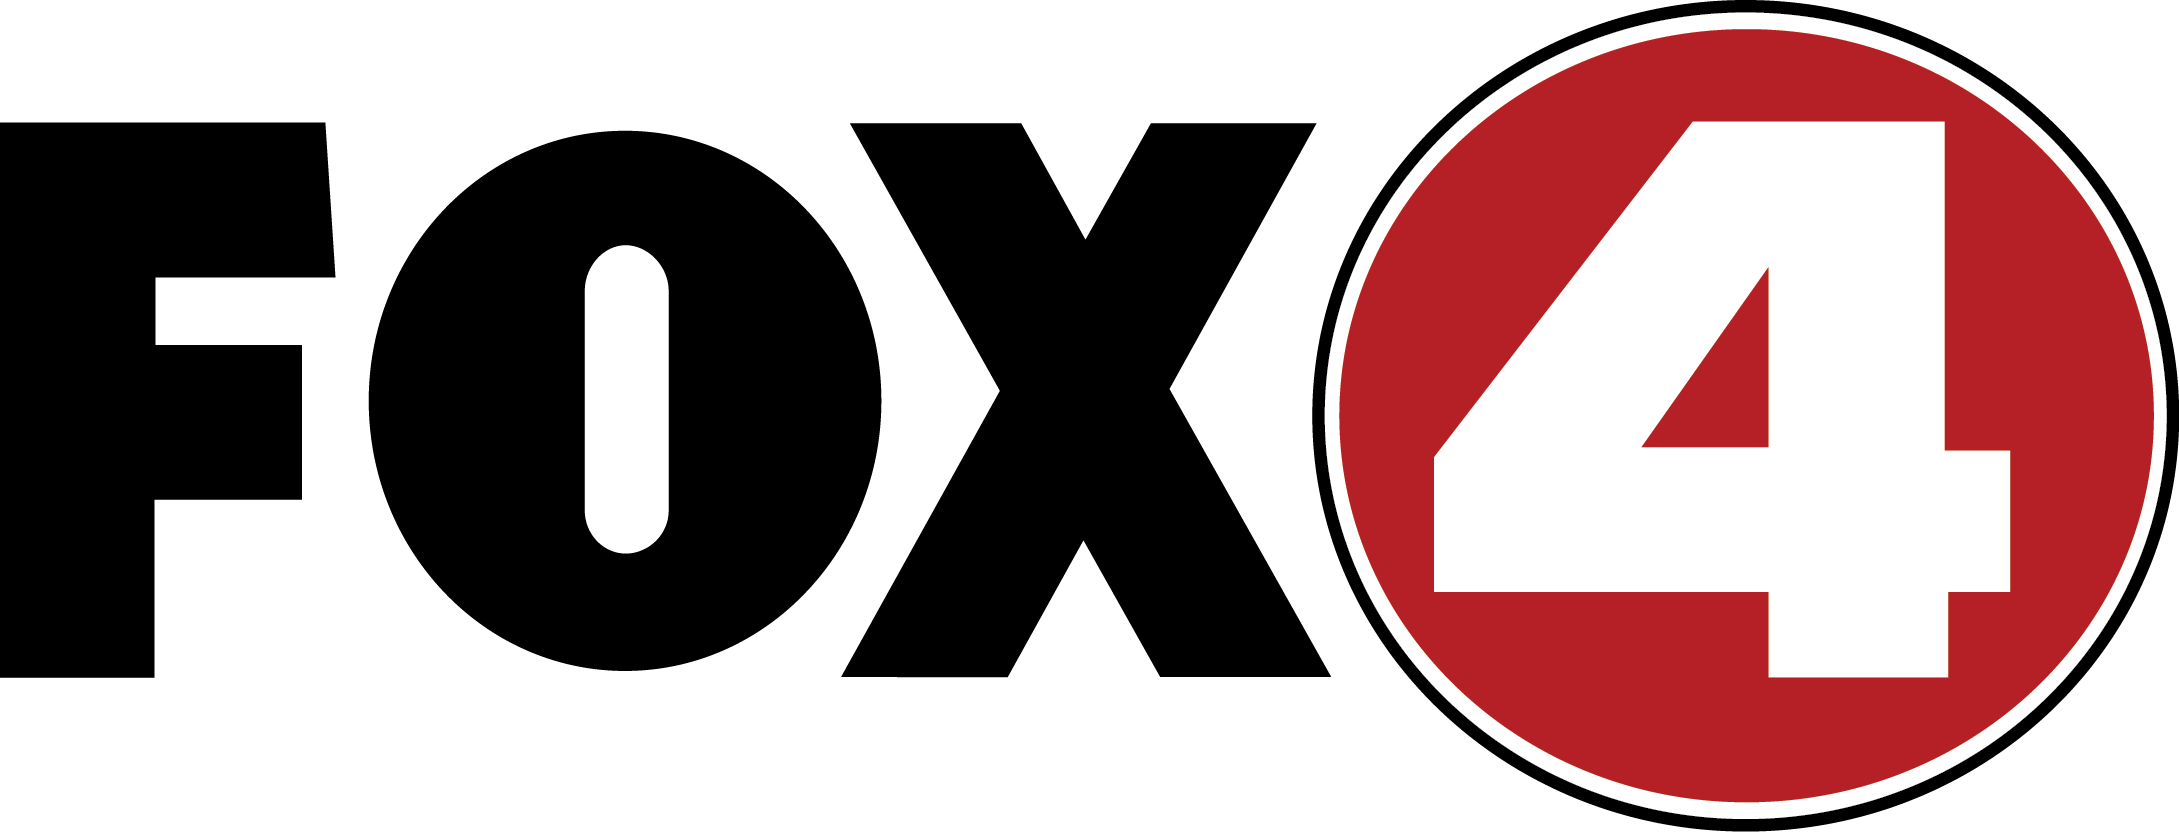 fox4_logo